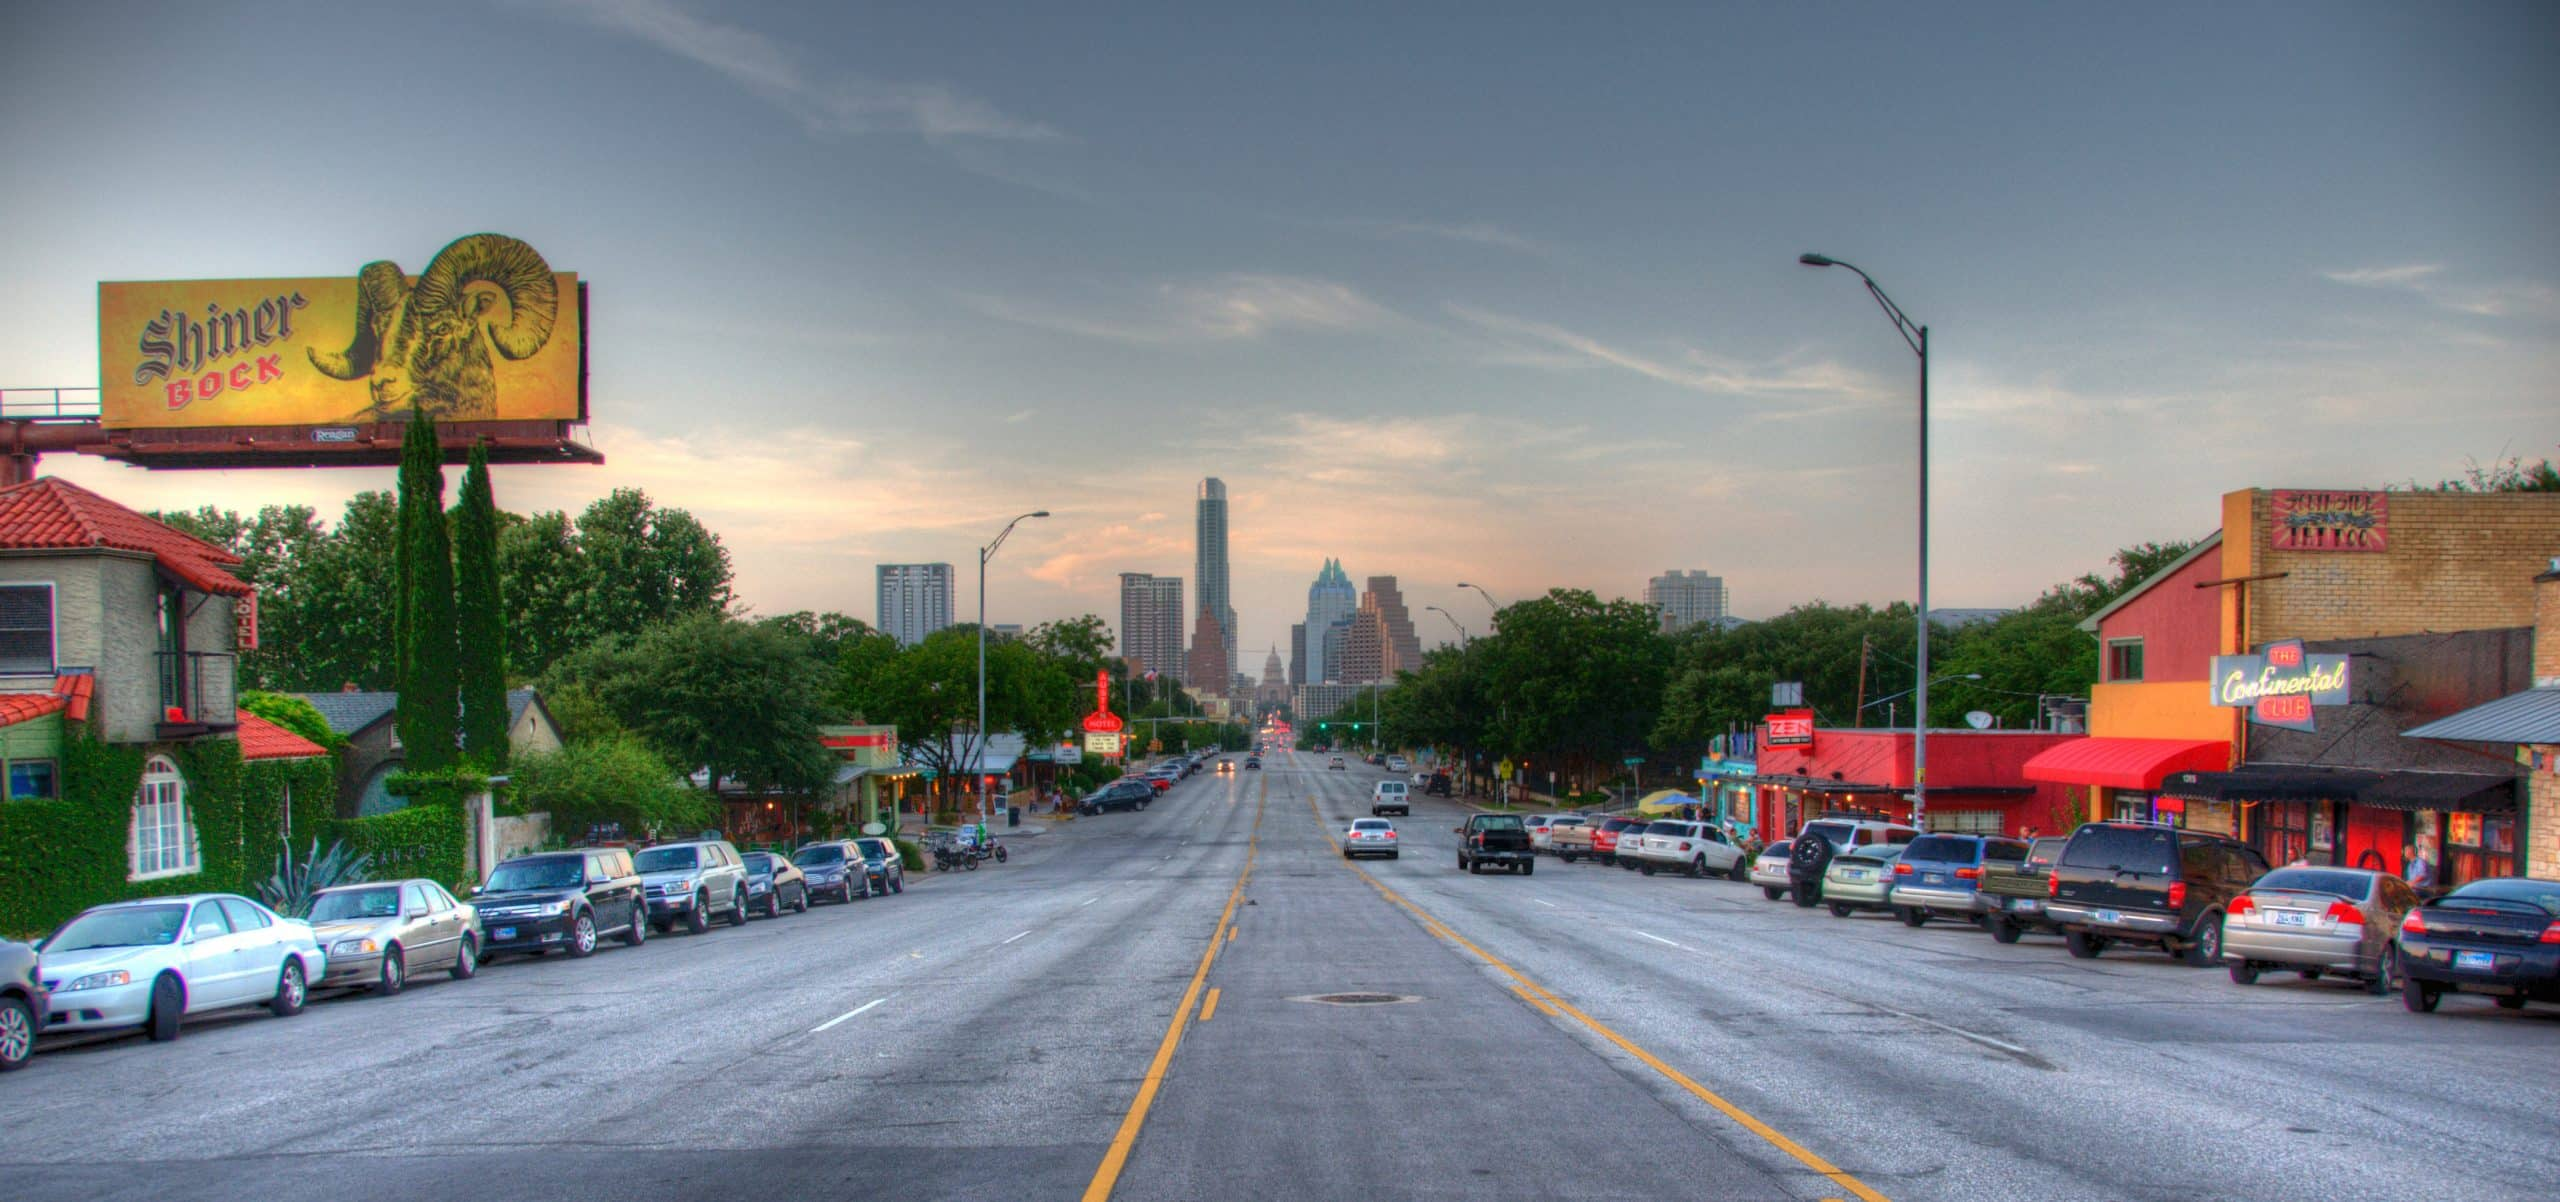 South Congress Austin